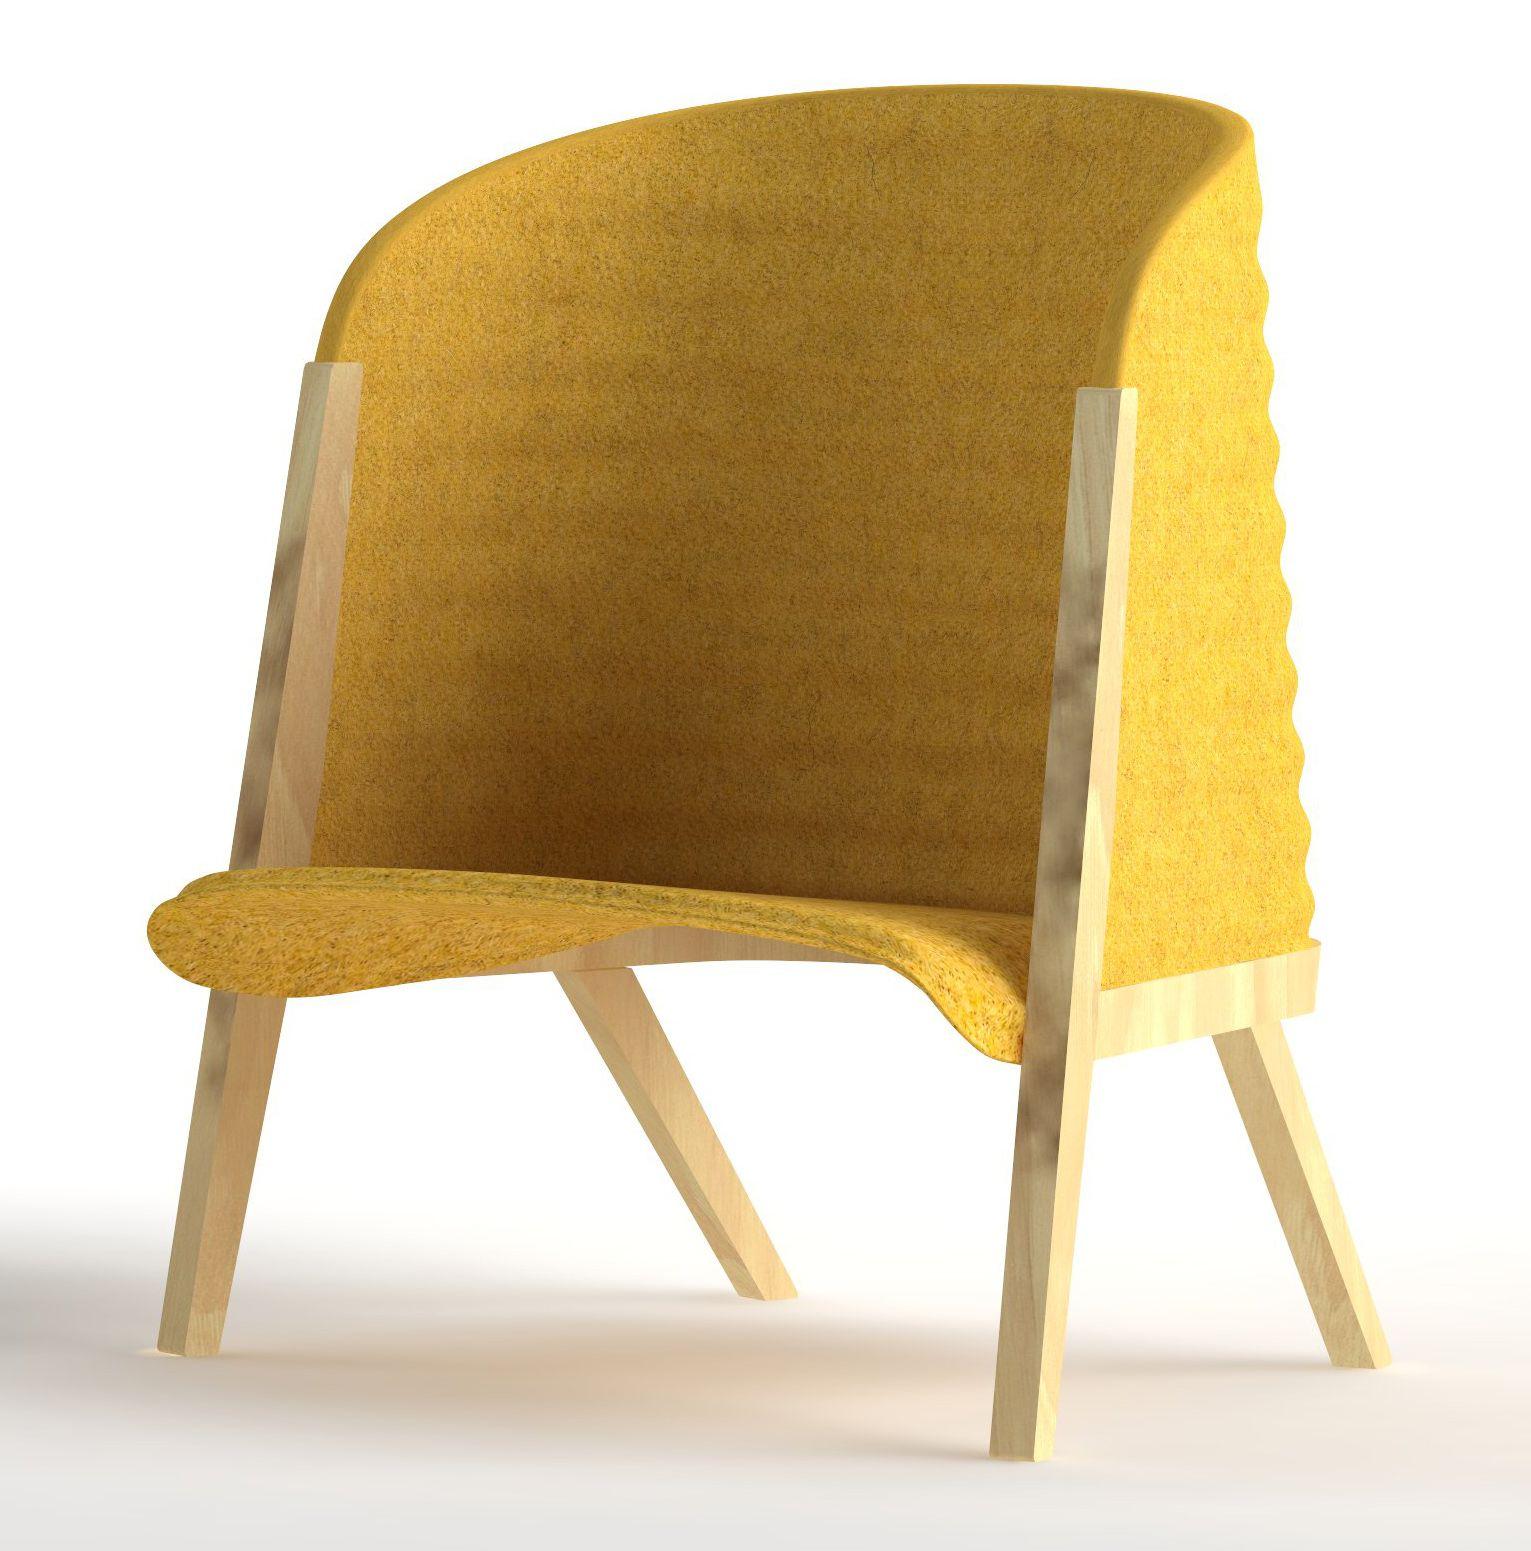 Mafalda stoel, materiaal is recyclebaar en is ook al gerecycled, door Patricia Urquiola voor Moroso | ELLE Decoration NL